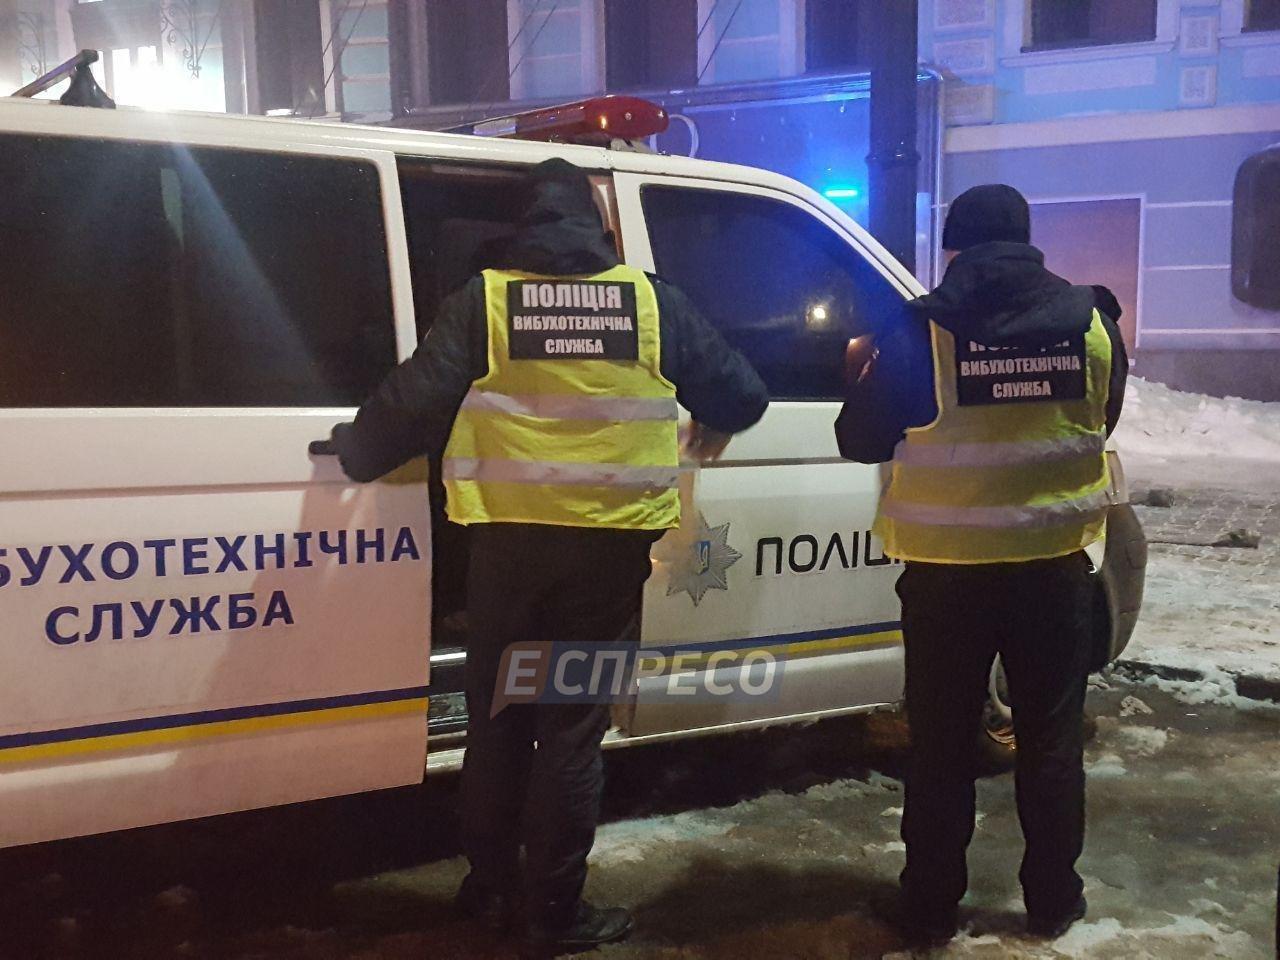 В Киеве из гранатомета расстреляли ресторан (ФОТО), фото-3